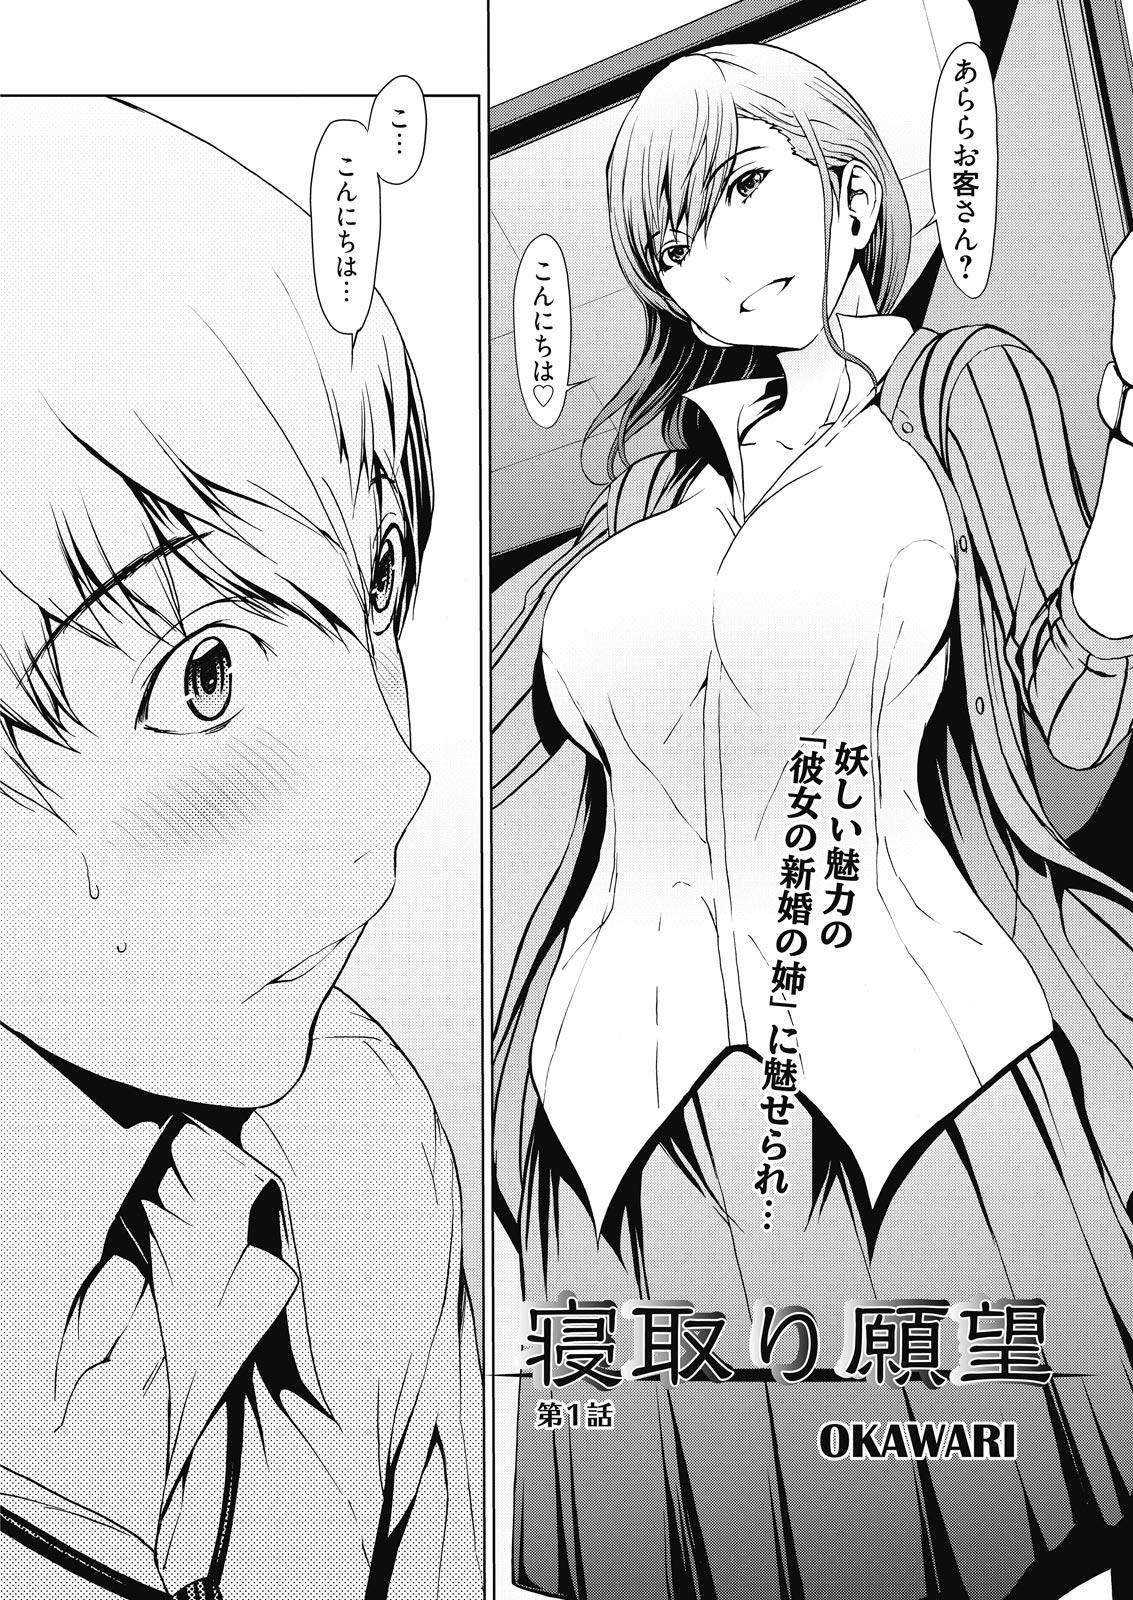 Web Manga Bangaichi Vol. 7 81